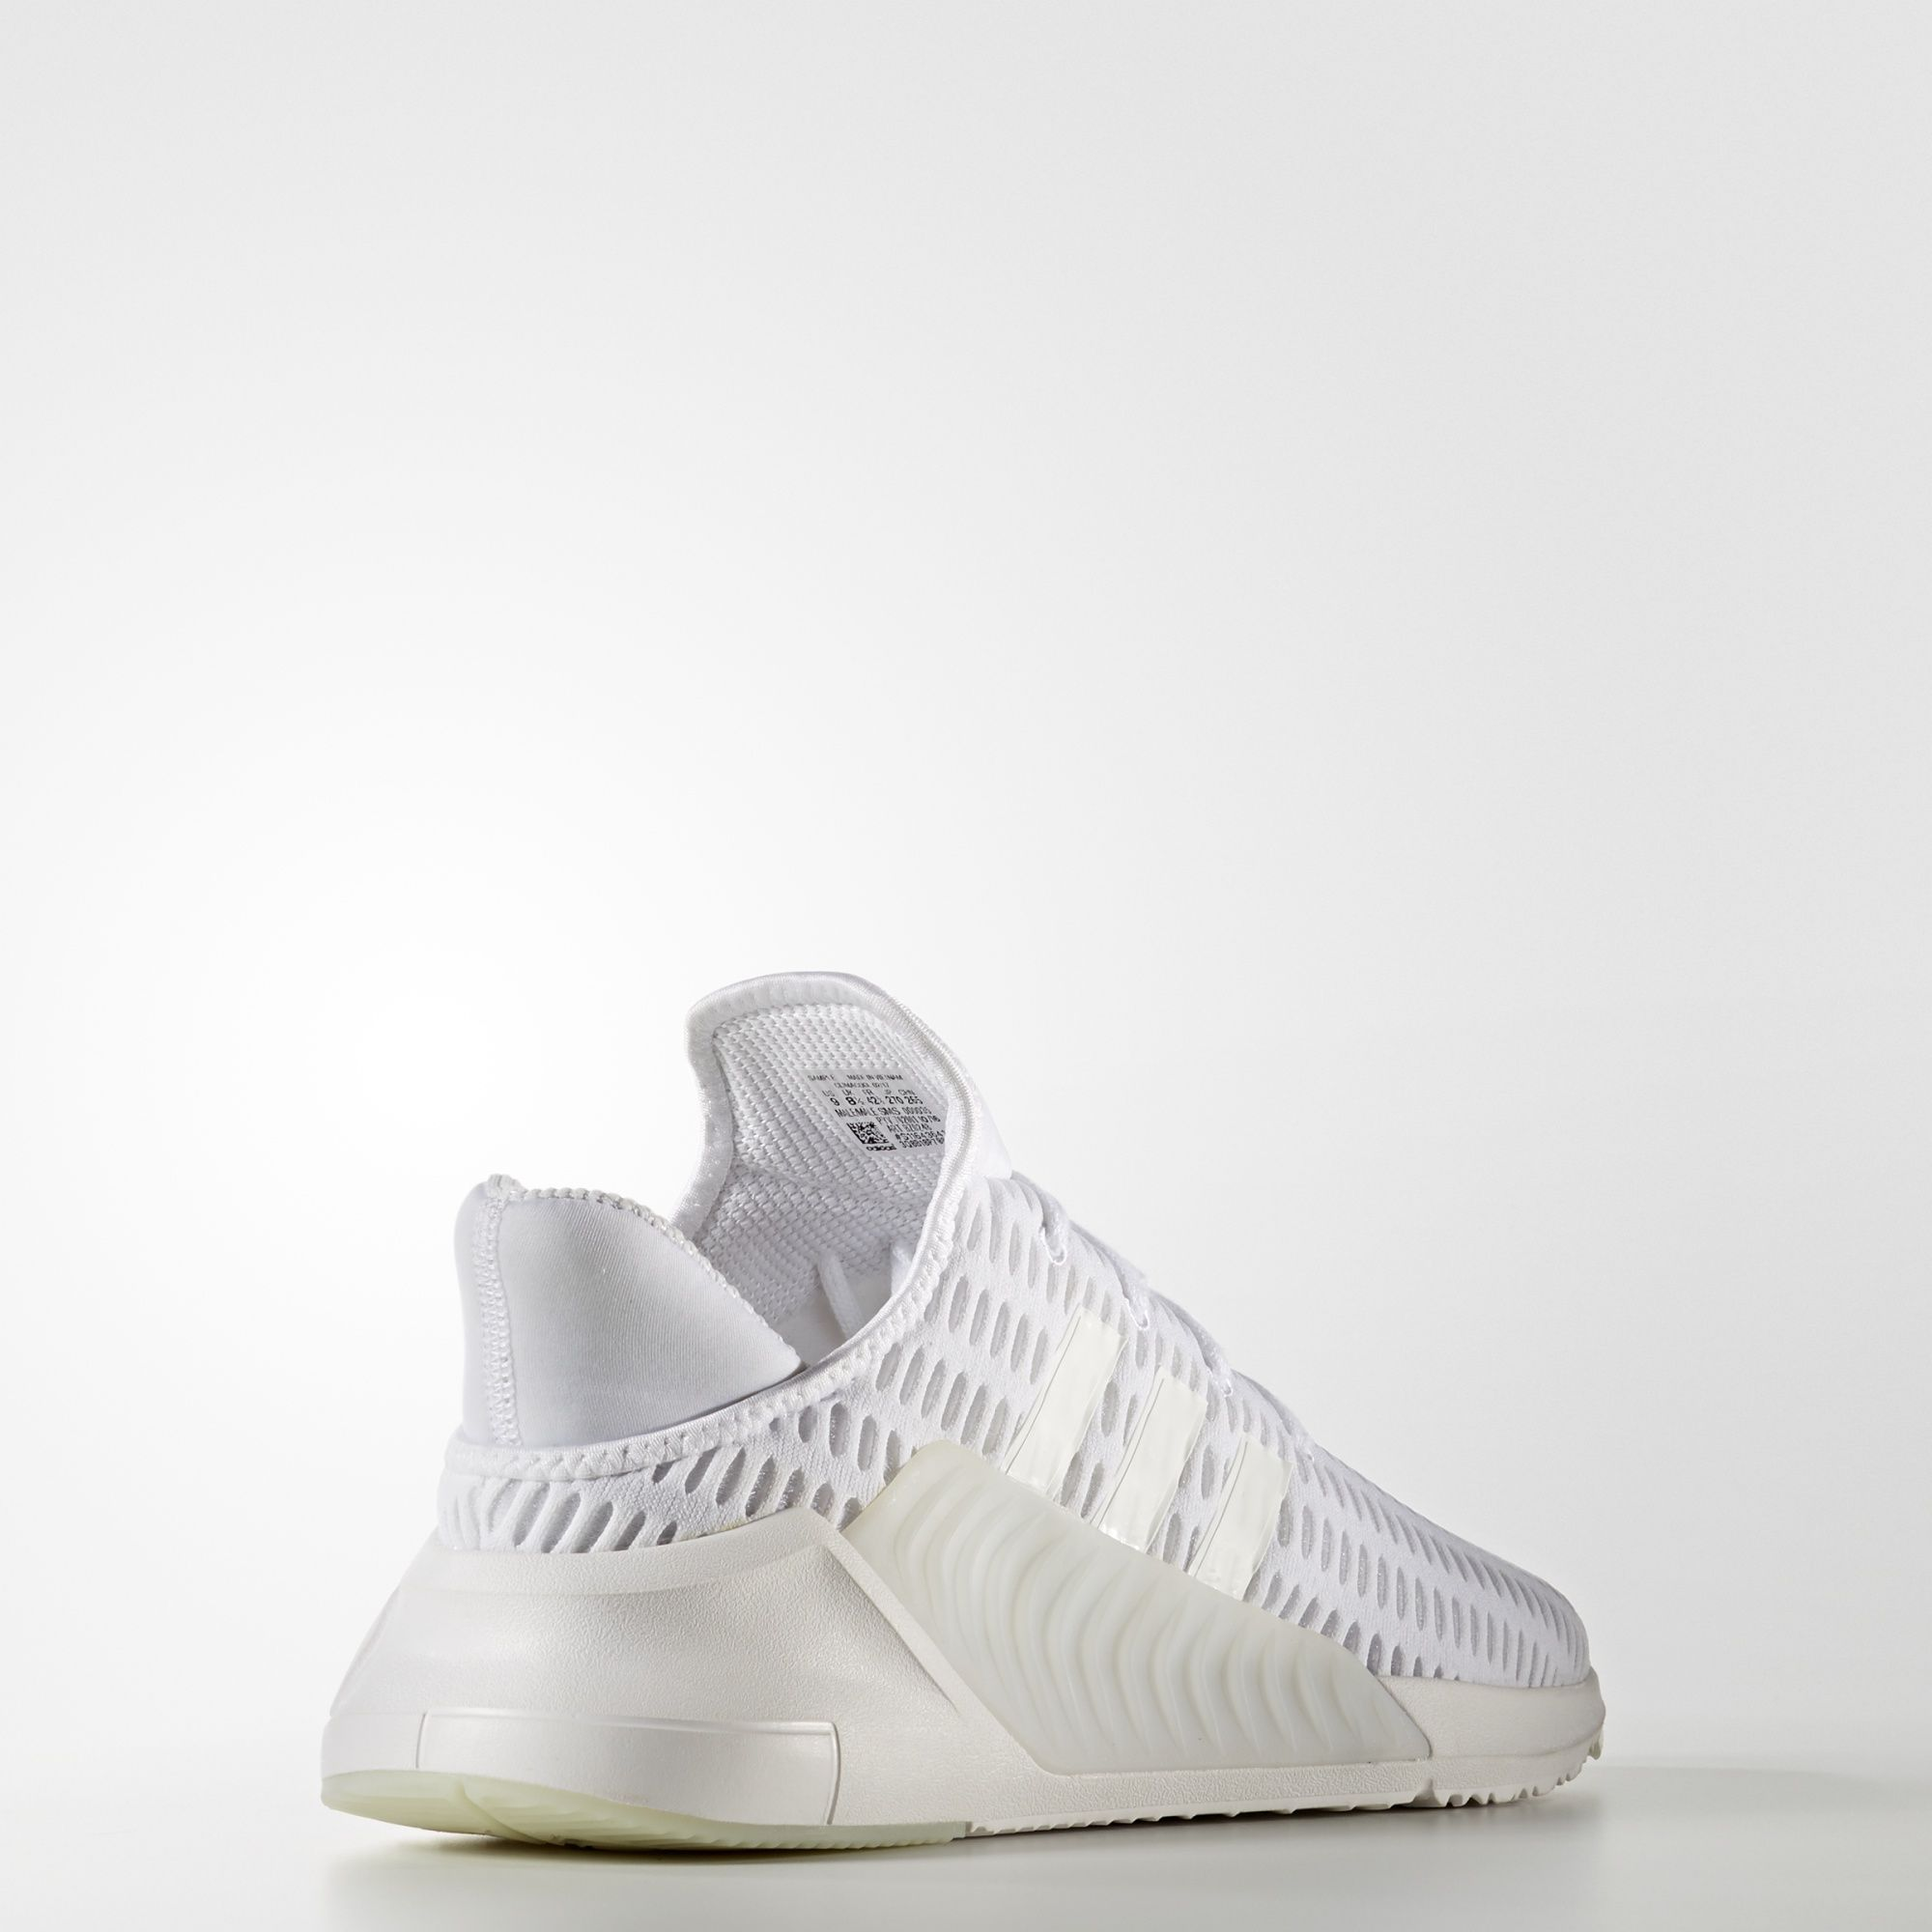 BZ0248 adidas ClimaCool 02 17 Triple White 3